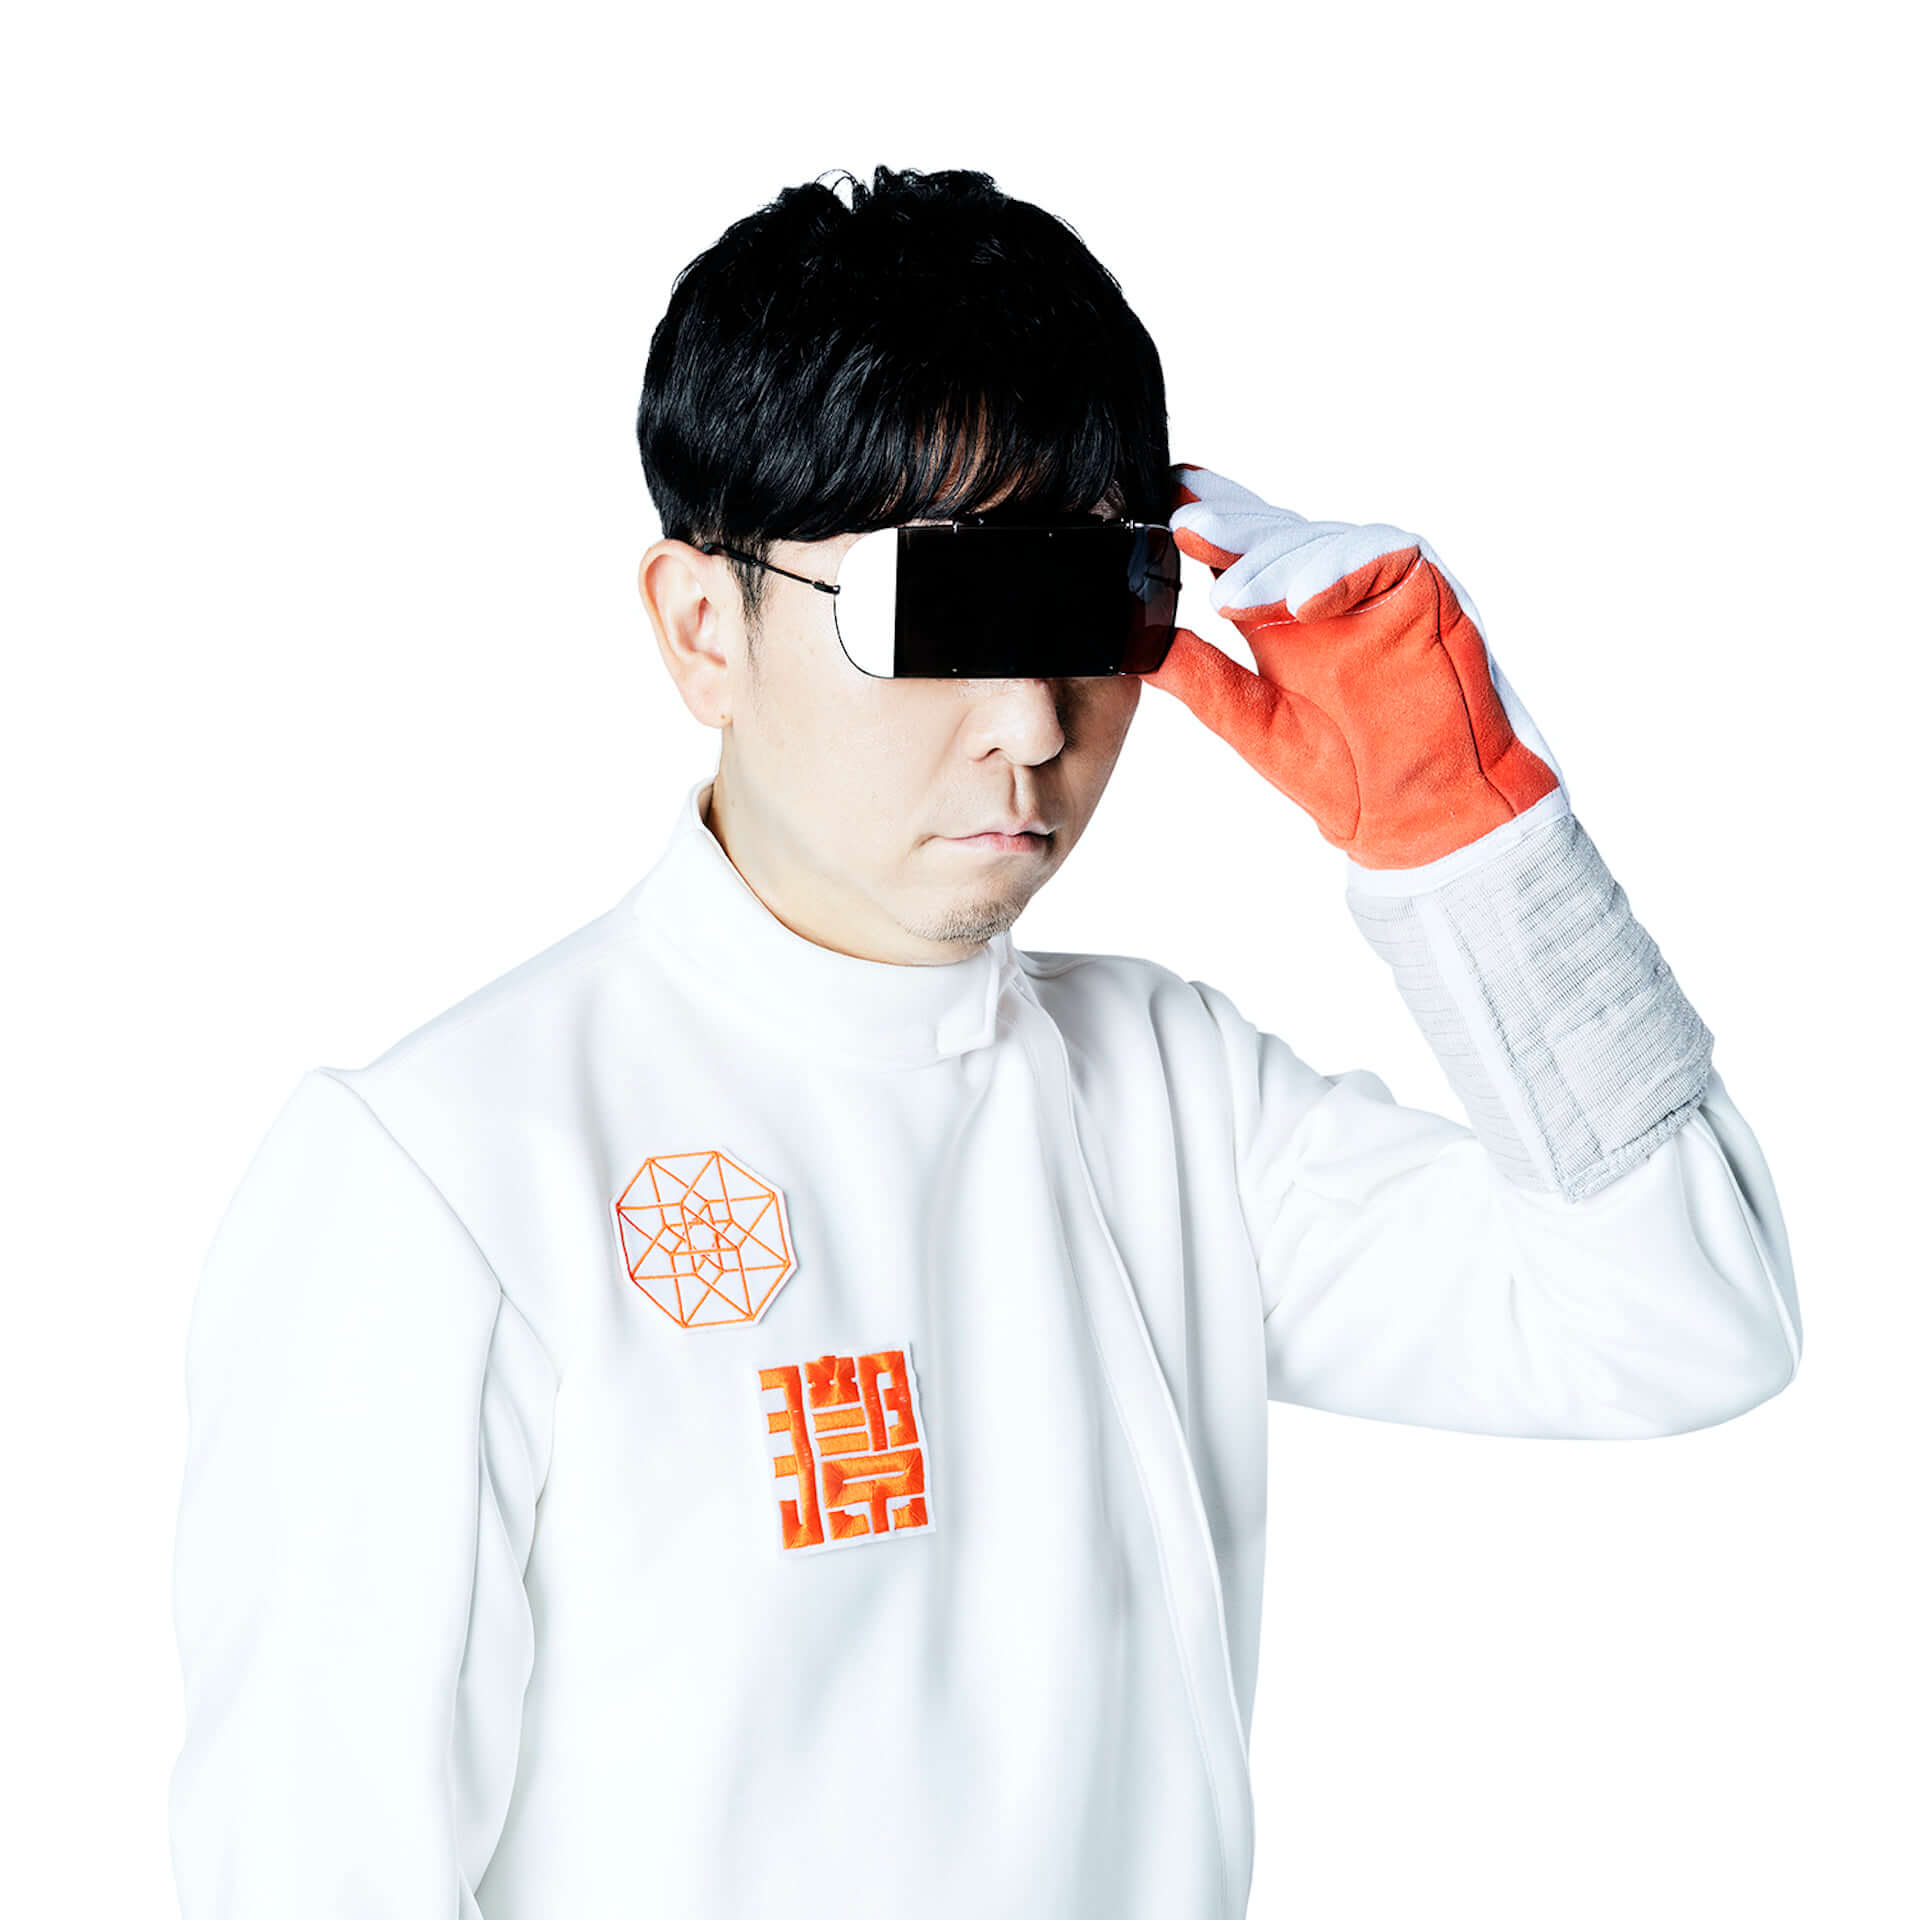 glo™とblock.fmによる配信企画にSeiho、SHINICHI OSAWA、tofubeats、☆Taku Takahashi、DJ EMMAが出演決定! music200713_glo-blockfm_4-1920x1920